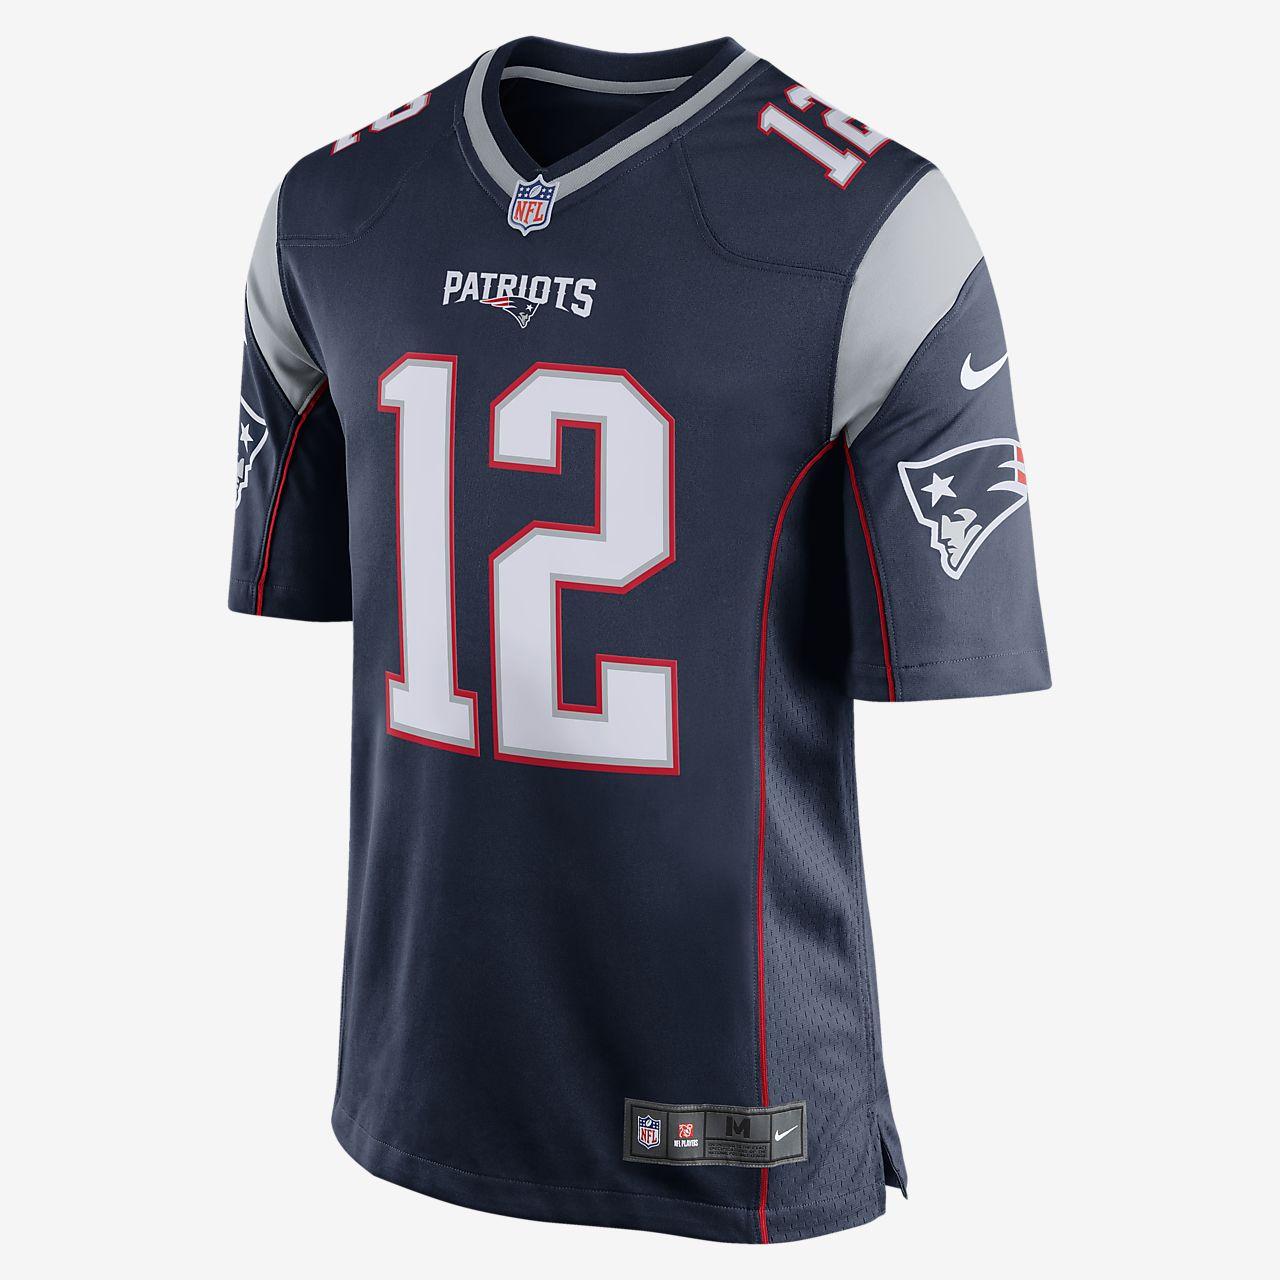 NFL New England Patriots (Tom Brady) Erkek Amerikan Futbolu İç Saha Maç Forması